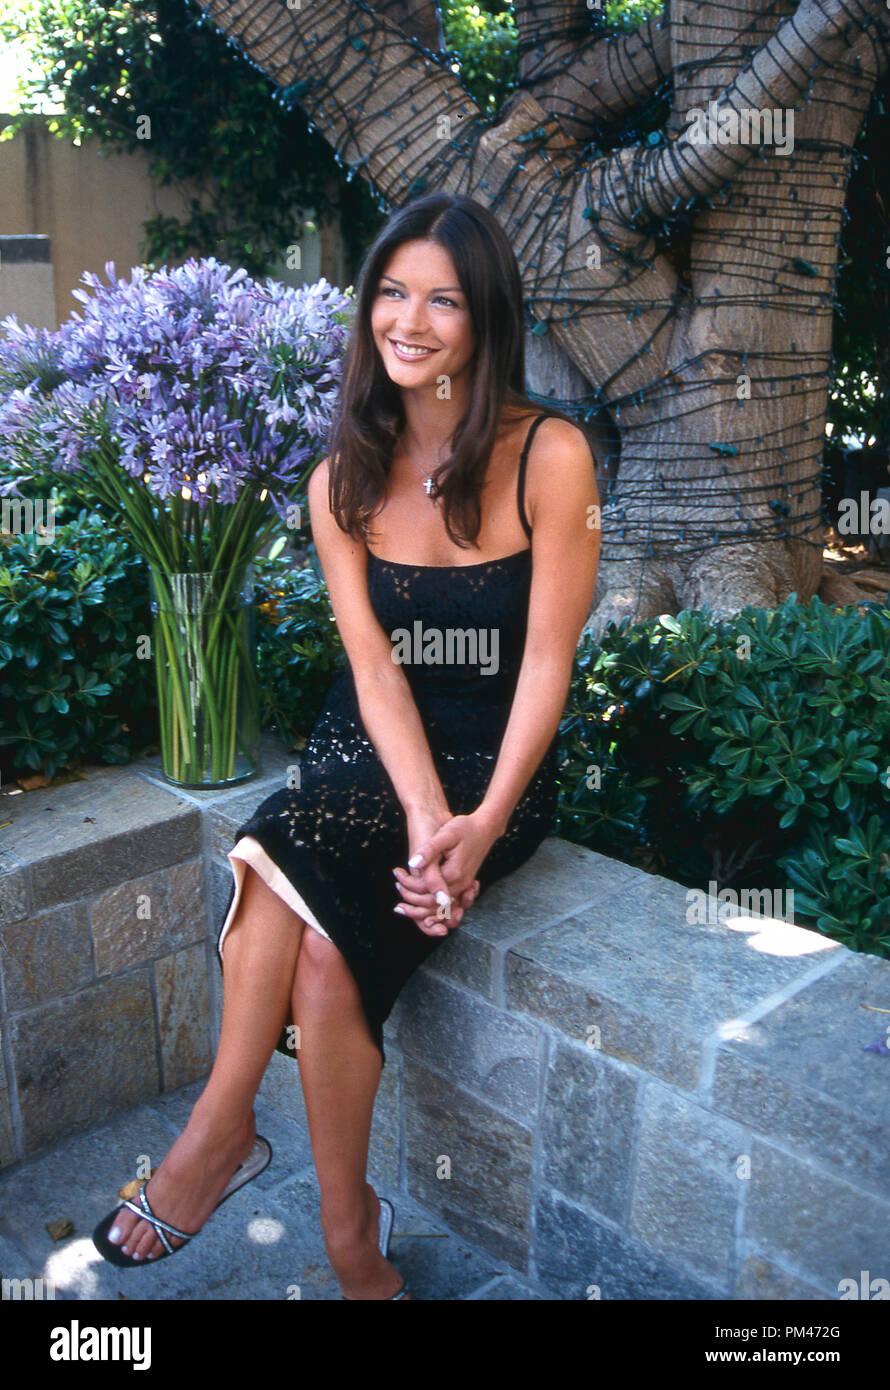 Catherine Zeta-Jones, July 19, 1999.  File Reference # 1096_007JRC - Stock Image